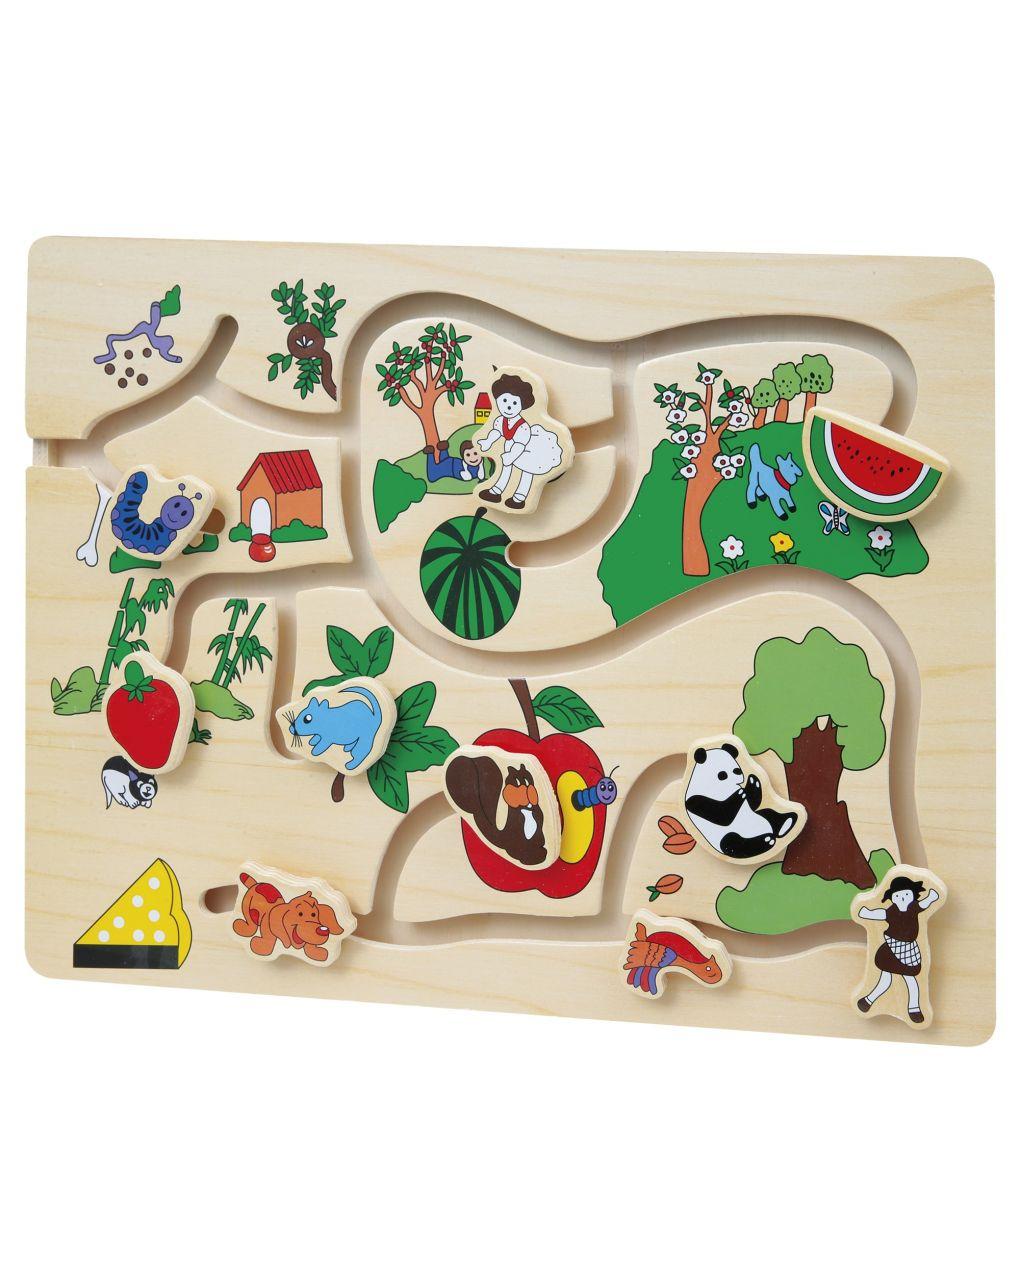 Wood'n'play - puzzle circuito - Wood'N'Play